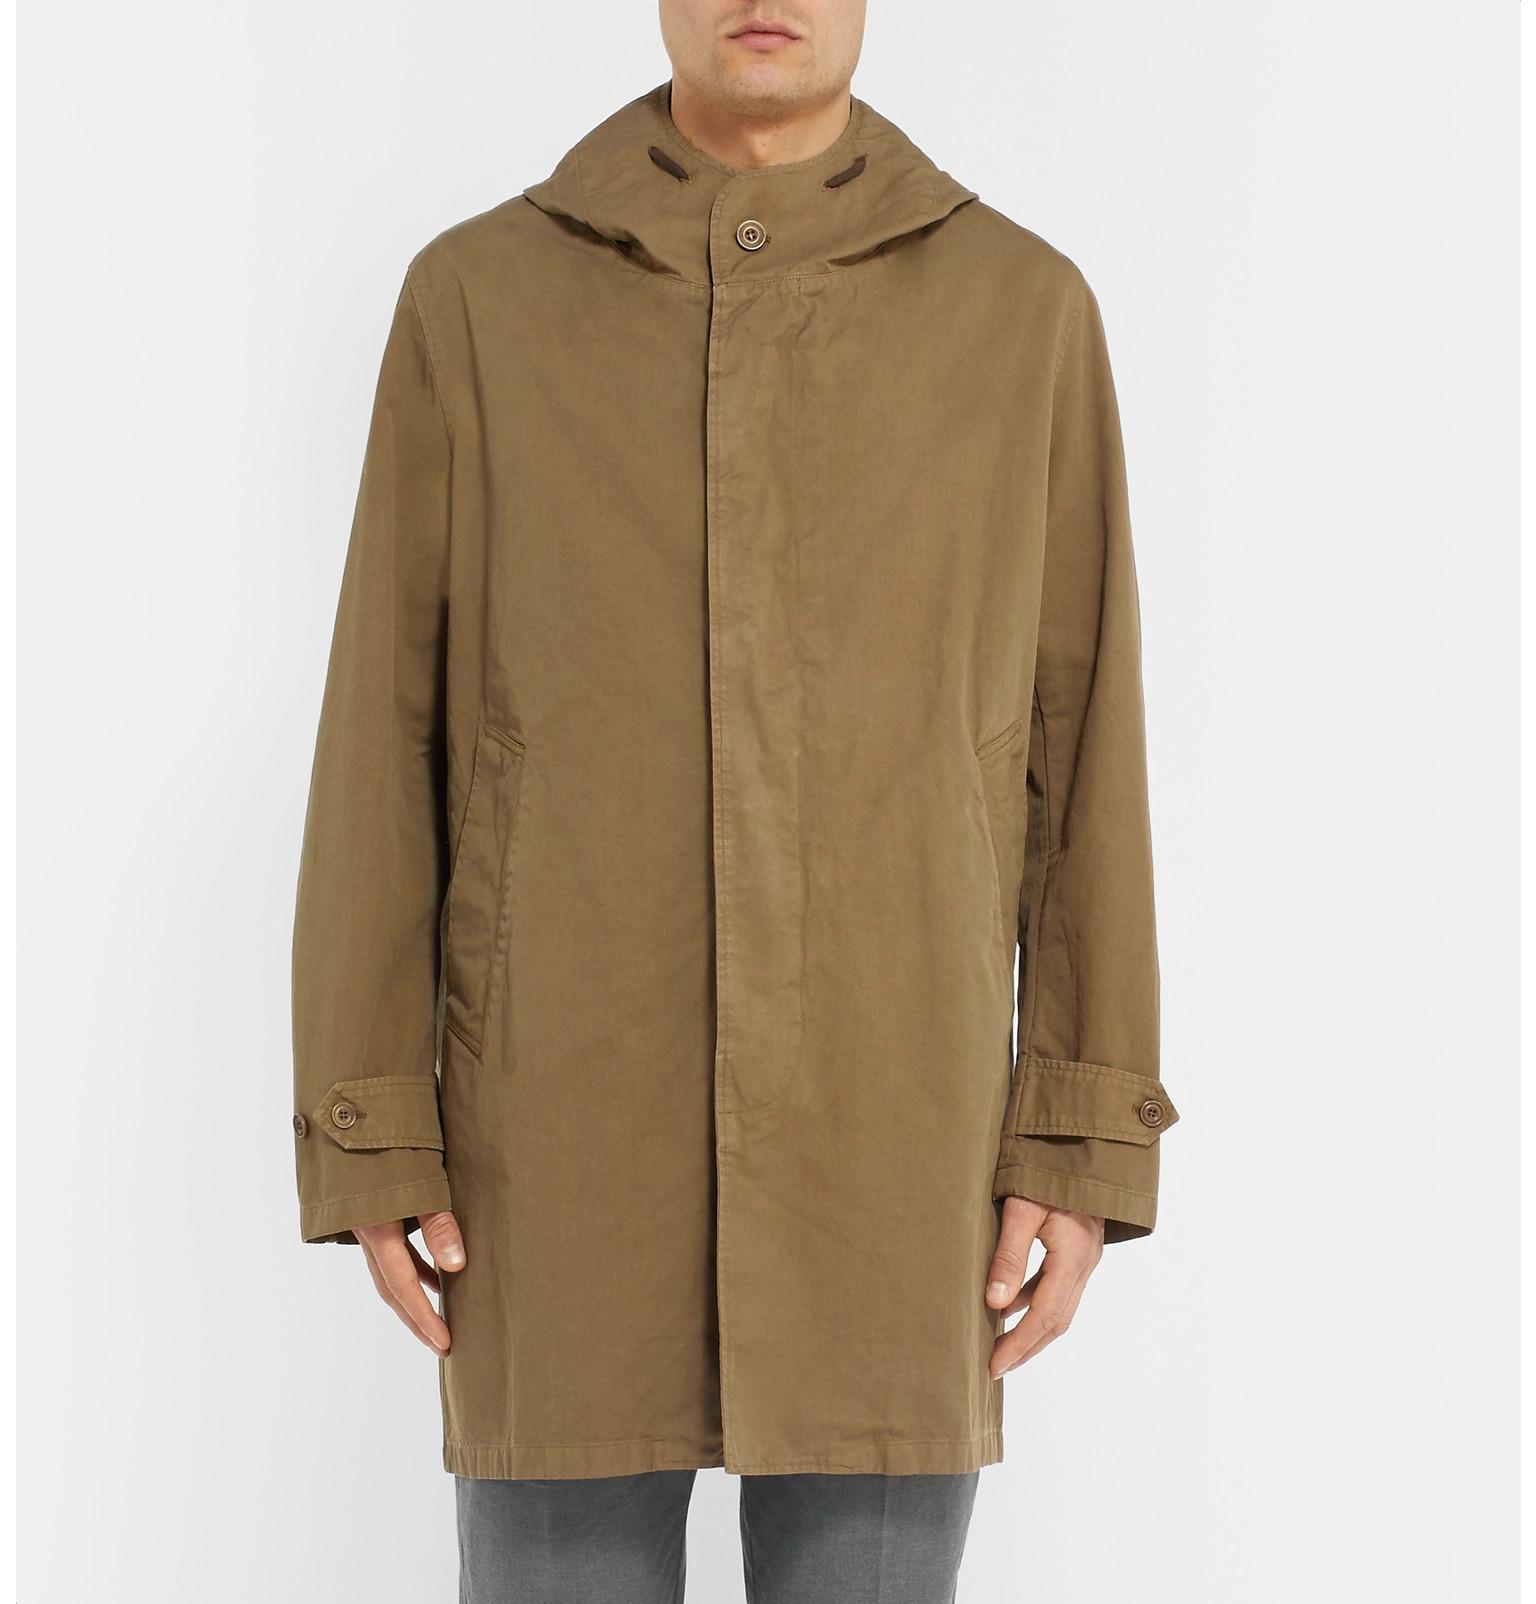 Hooded Beige Hartford Cotton Oversized Carter Coat twill qWwxU4Fx6t